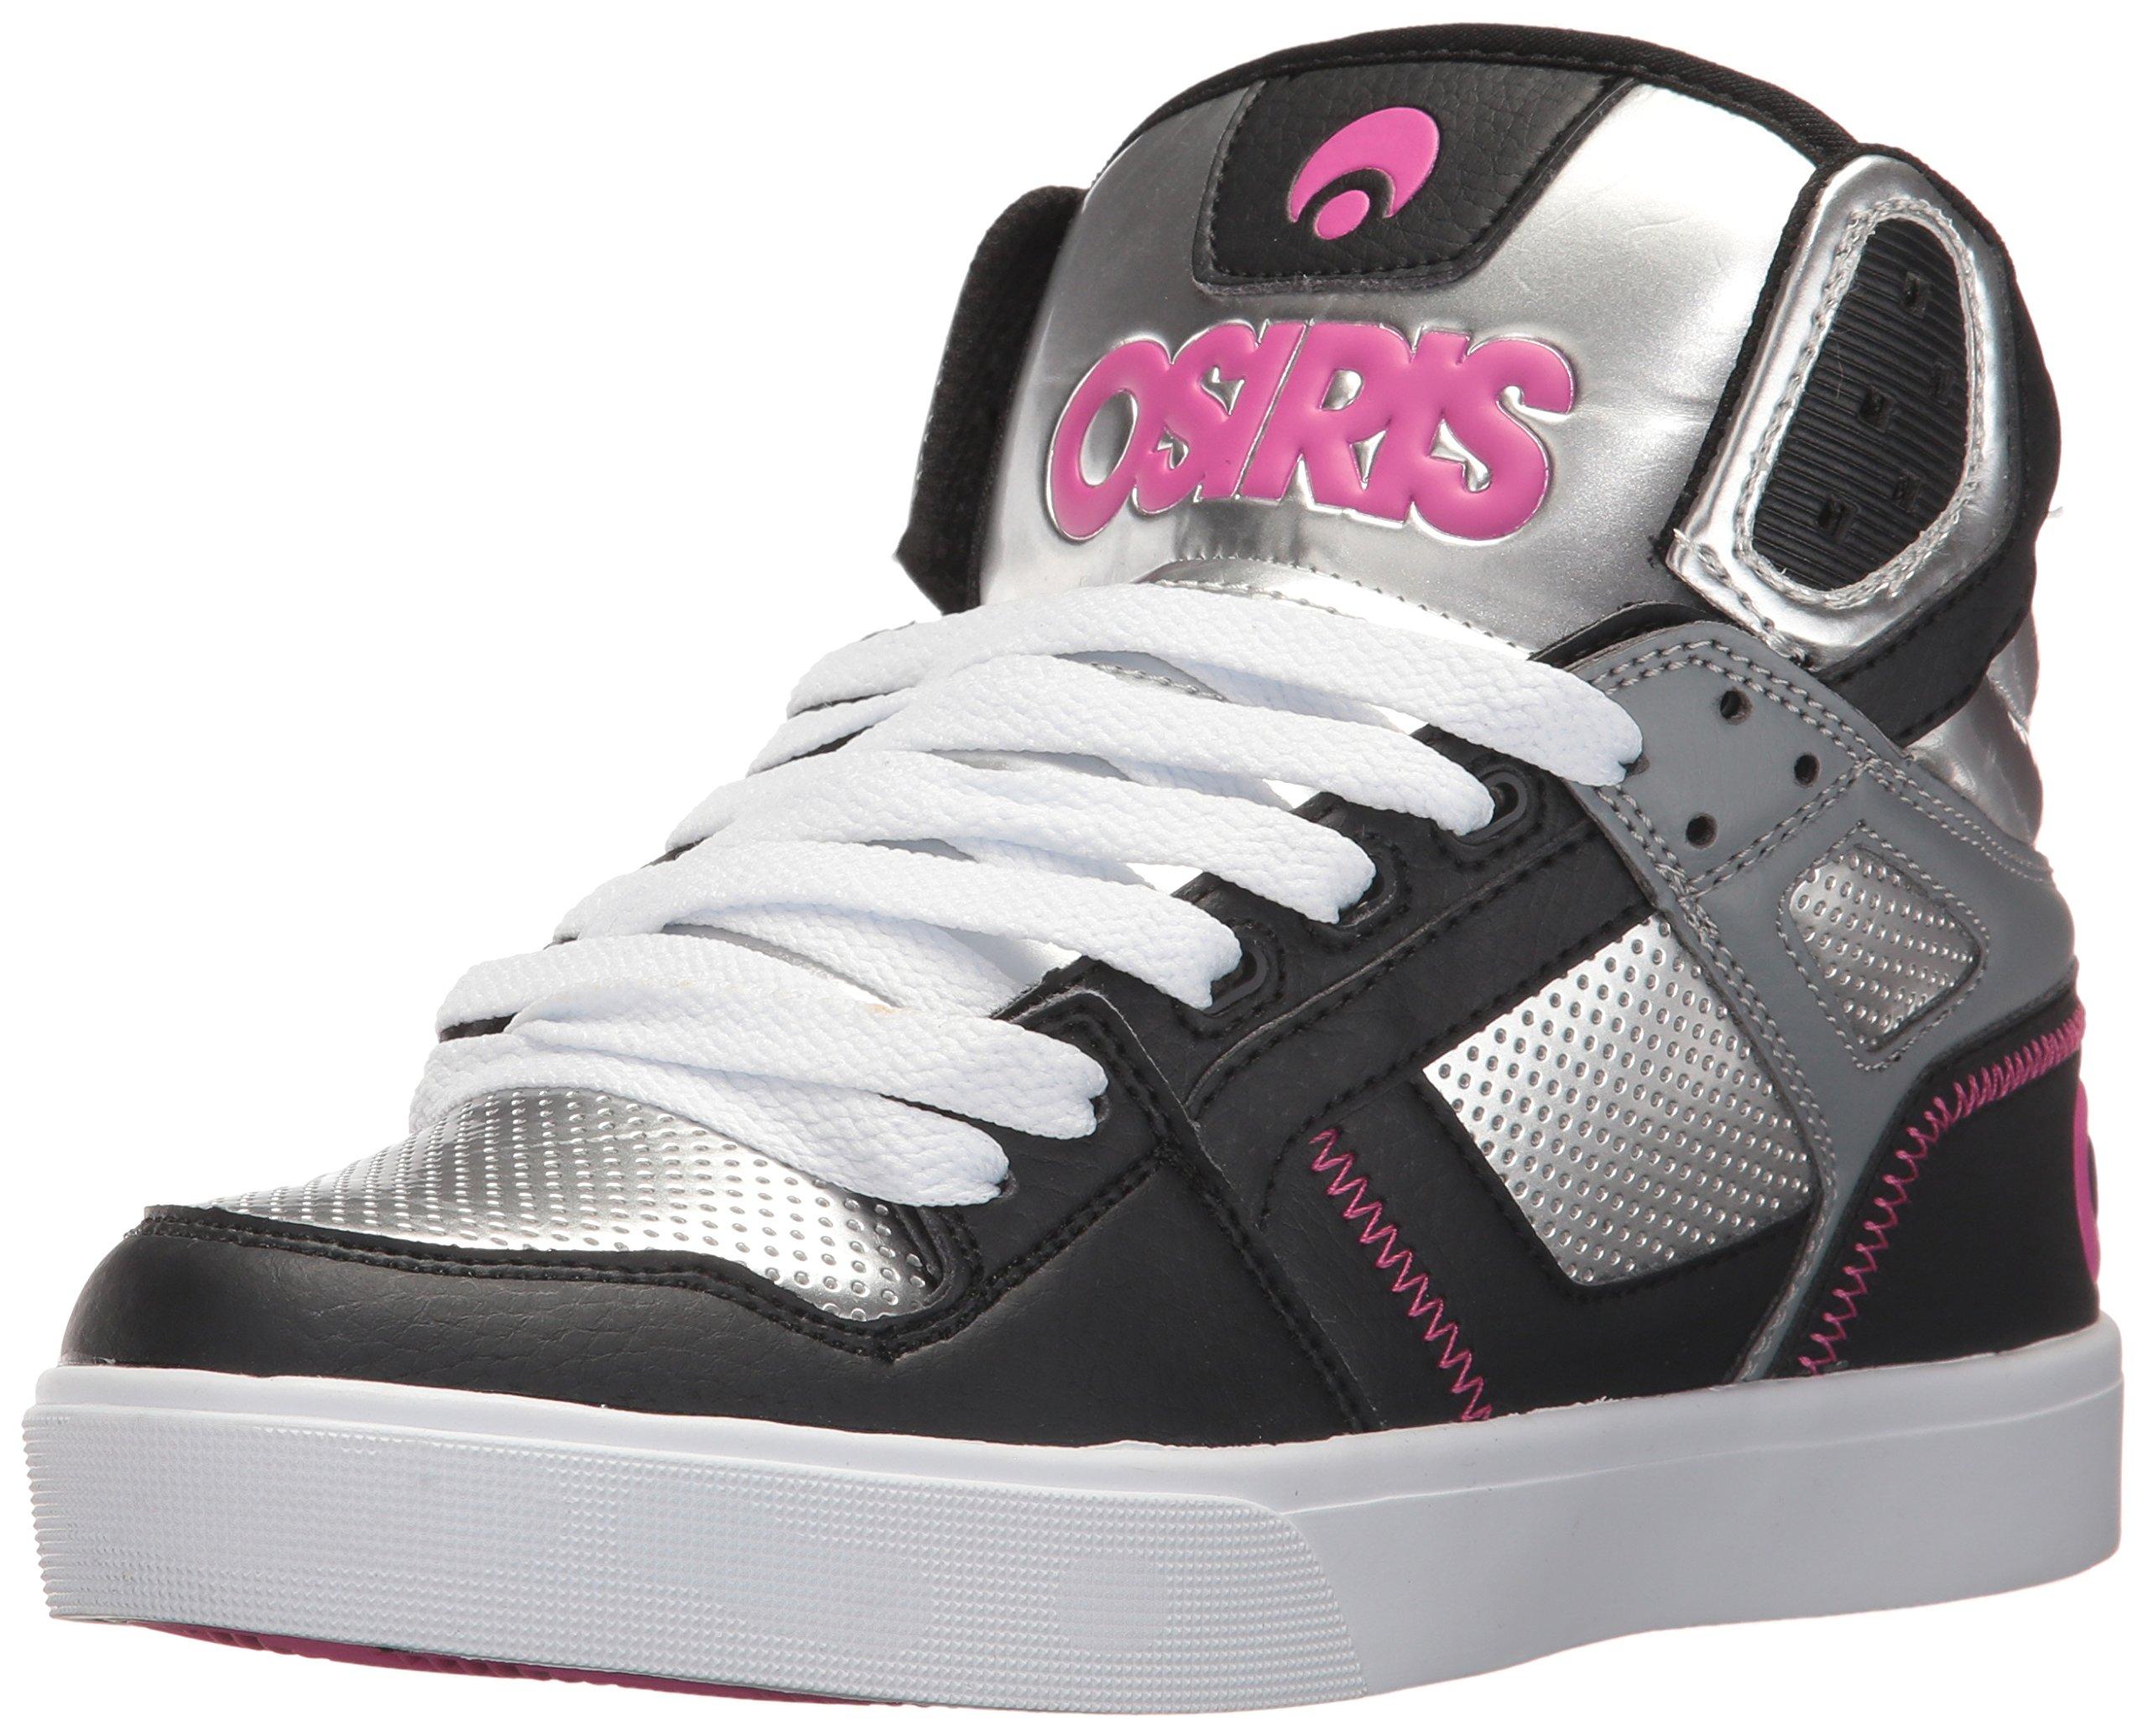 b9cb0f44d15 Galleon - Osiris Women's Clone Skate Shoe, Silver/Pink/Black, 6 M US